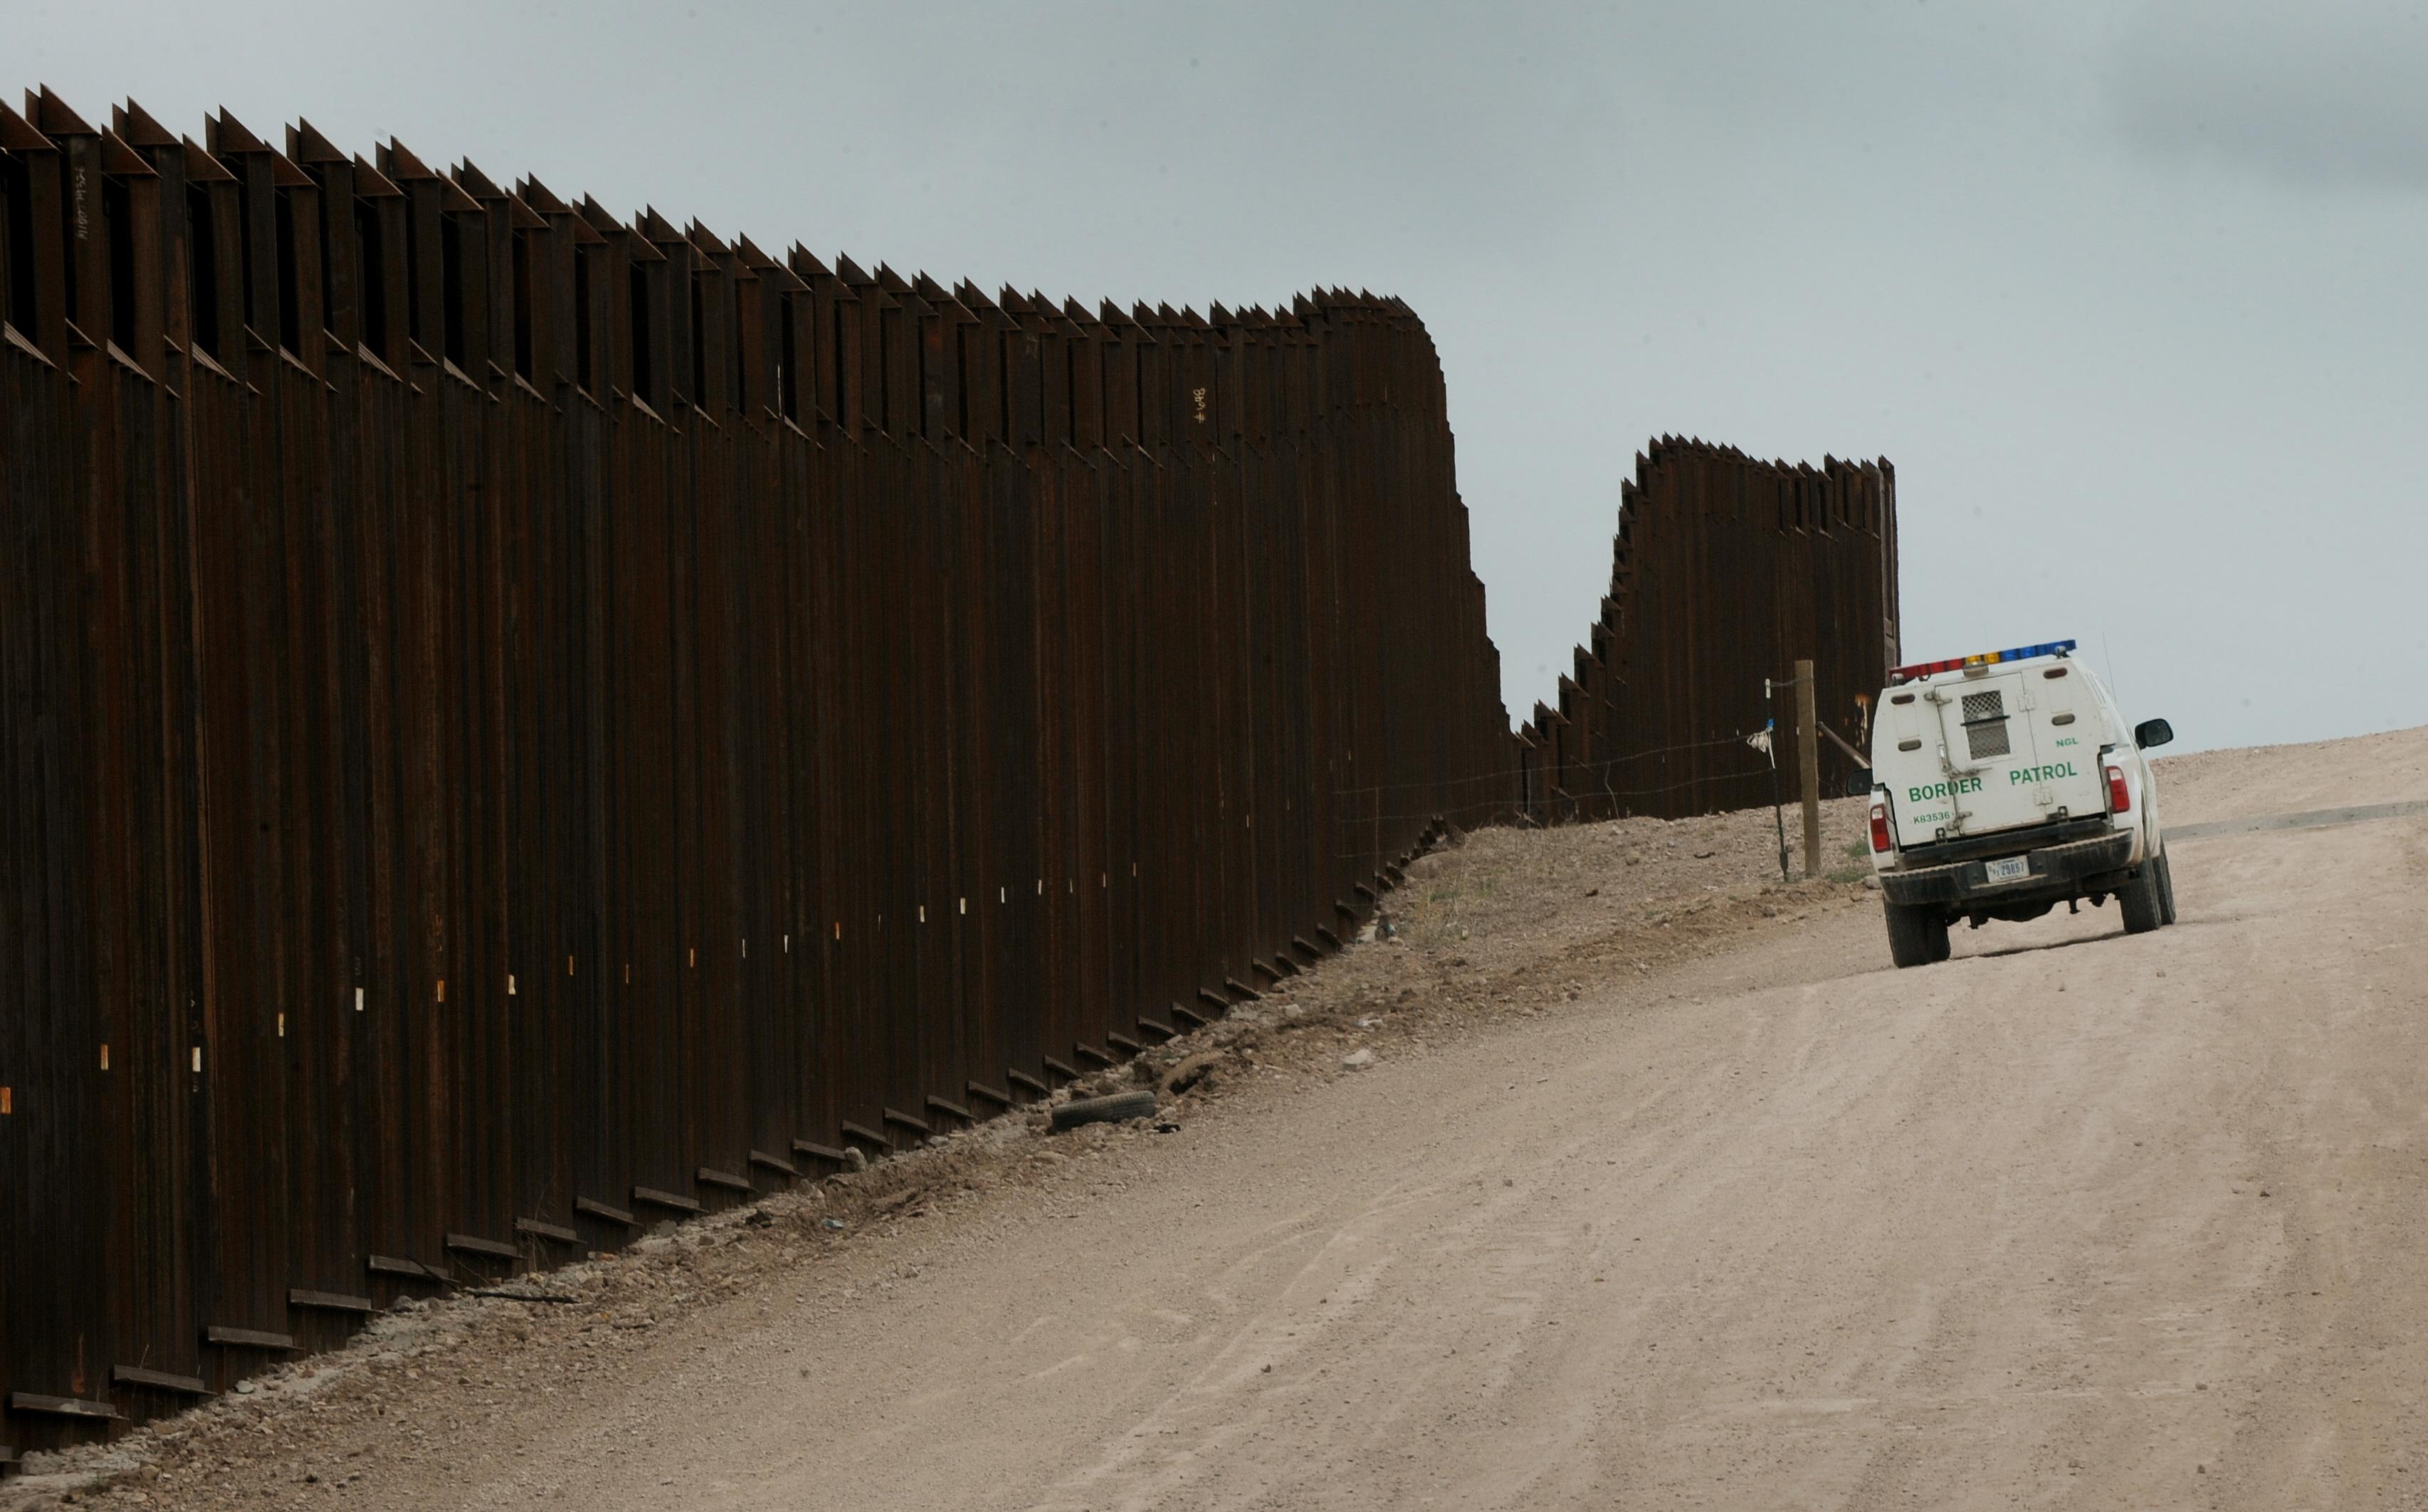 A US Border Patrol vehicle